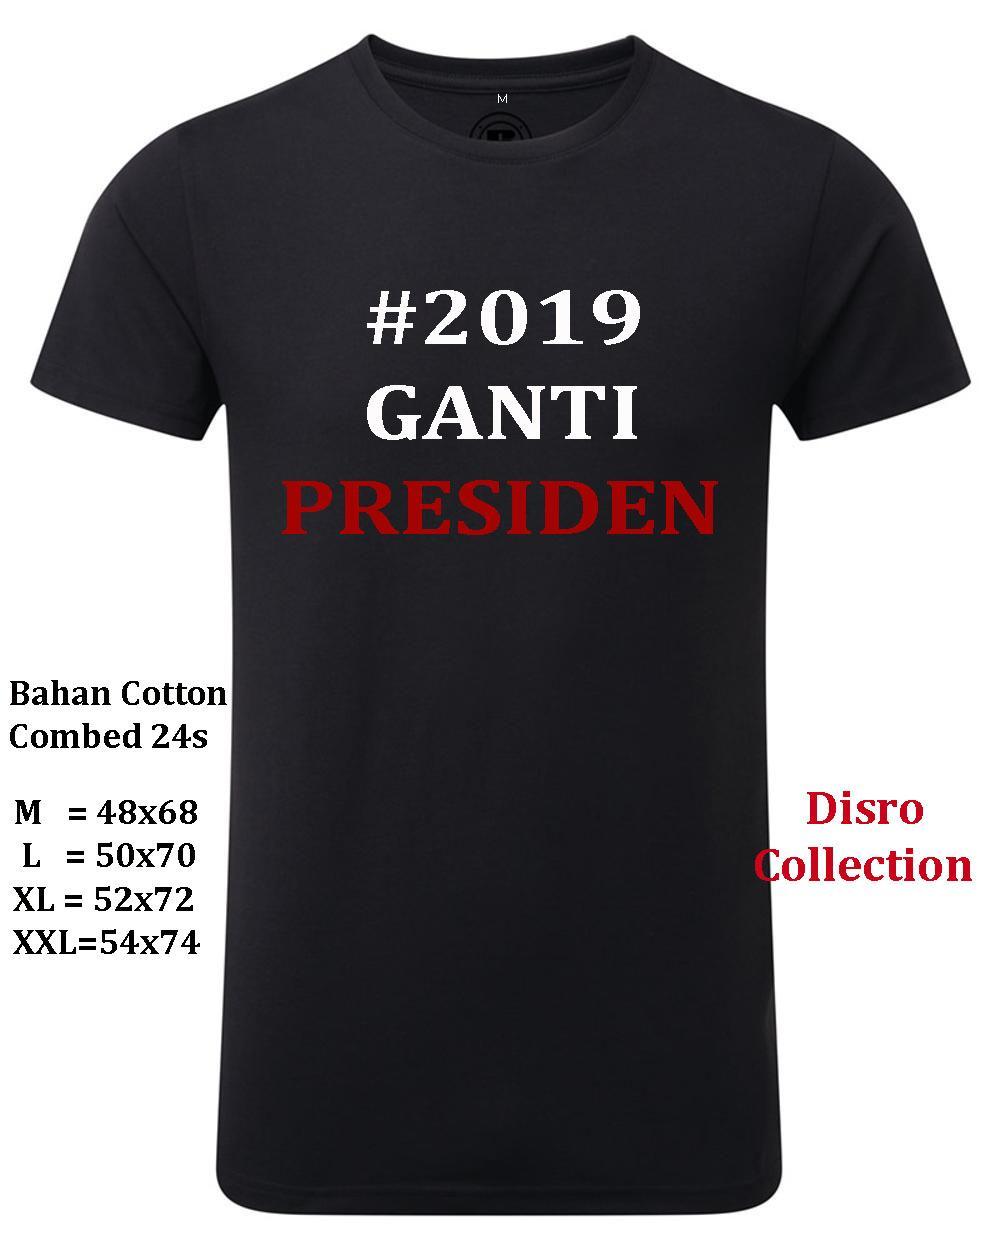 Disro Collection - #2019 GANTI PRESIDEN M L XL XXL Kaos Distro 100% Cotton Combed 24s Kaos Distro Fashion T-Shirt Baju Pakaian Pria Wanita Cewe Cowo Harga Murah Kaos 2019 GANTI PRESIDEN